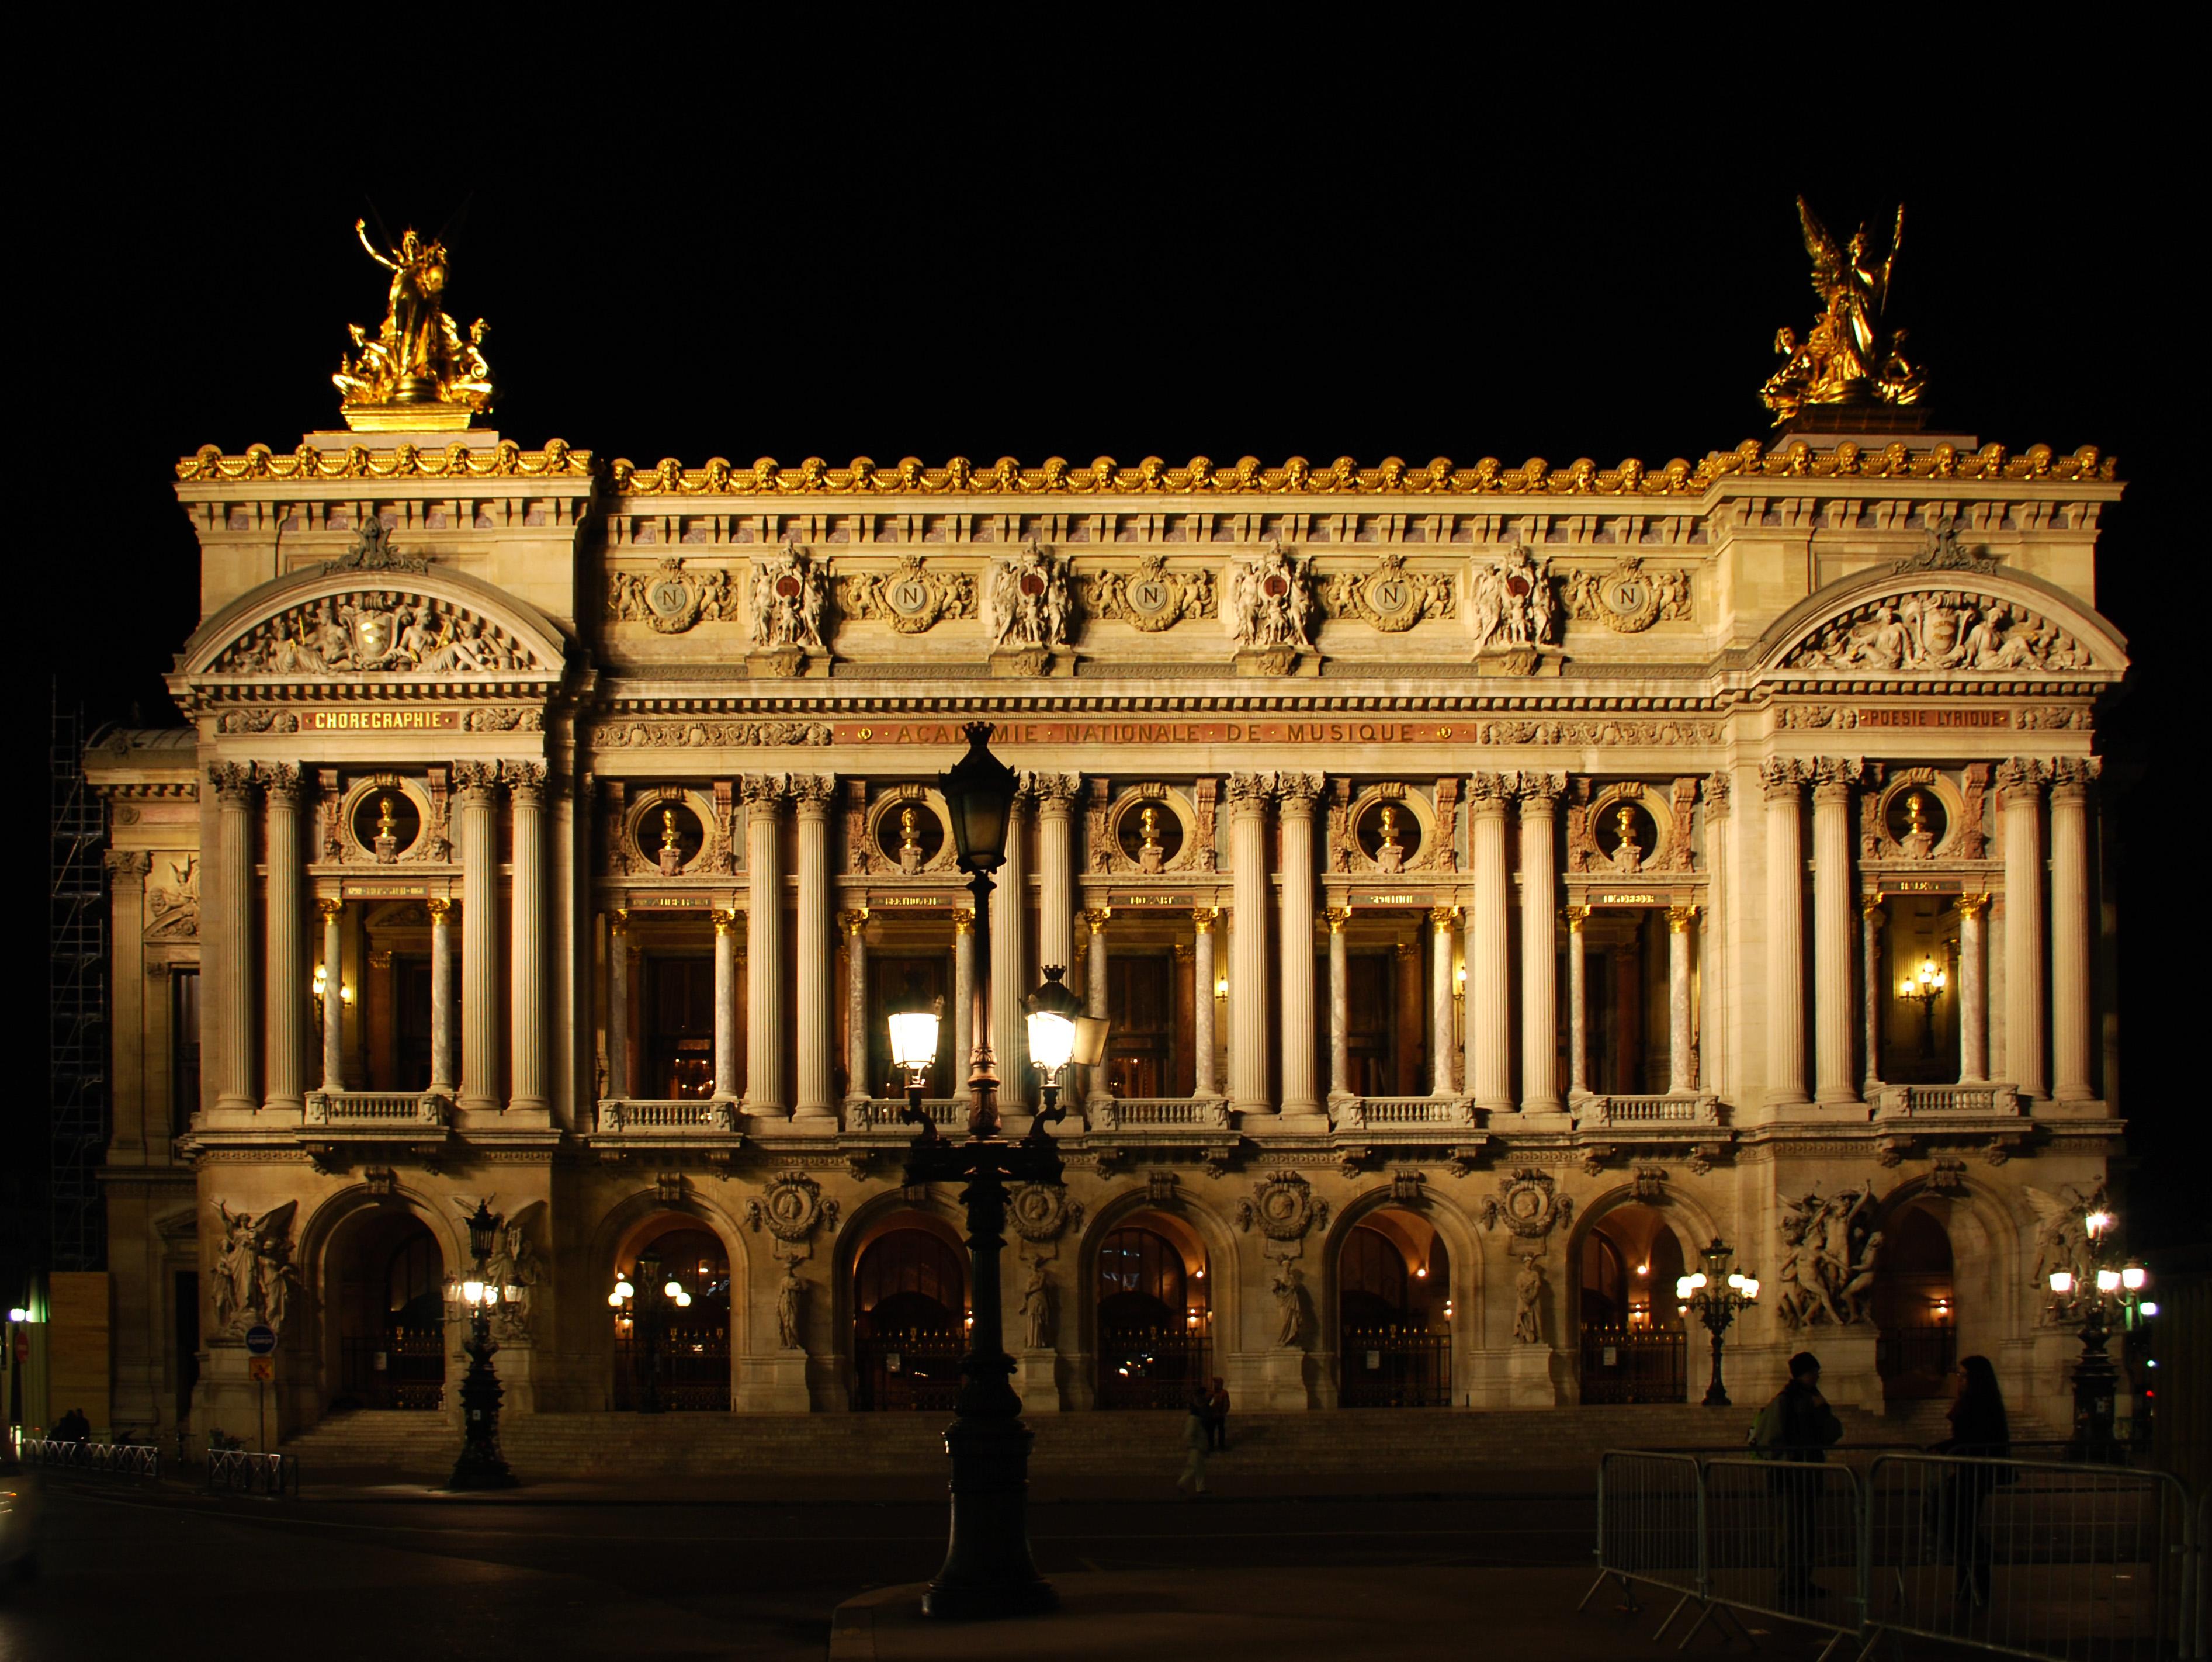 File:Opera Garnier night front.JPG - Wikimedia Commons